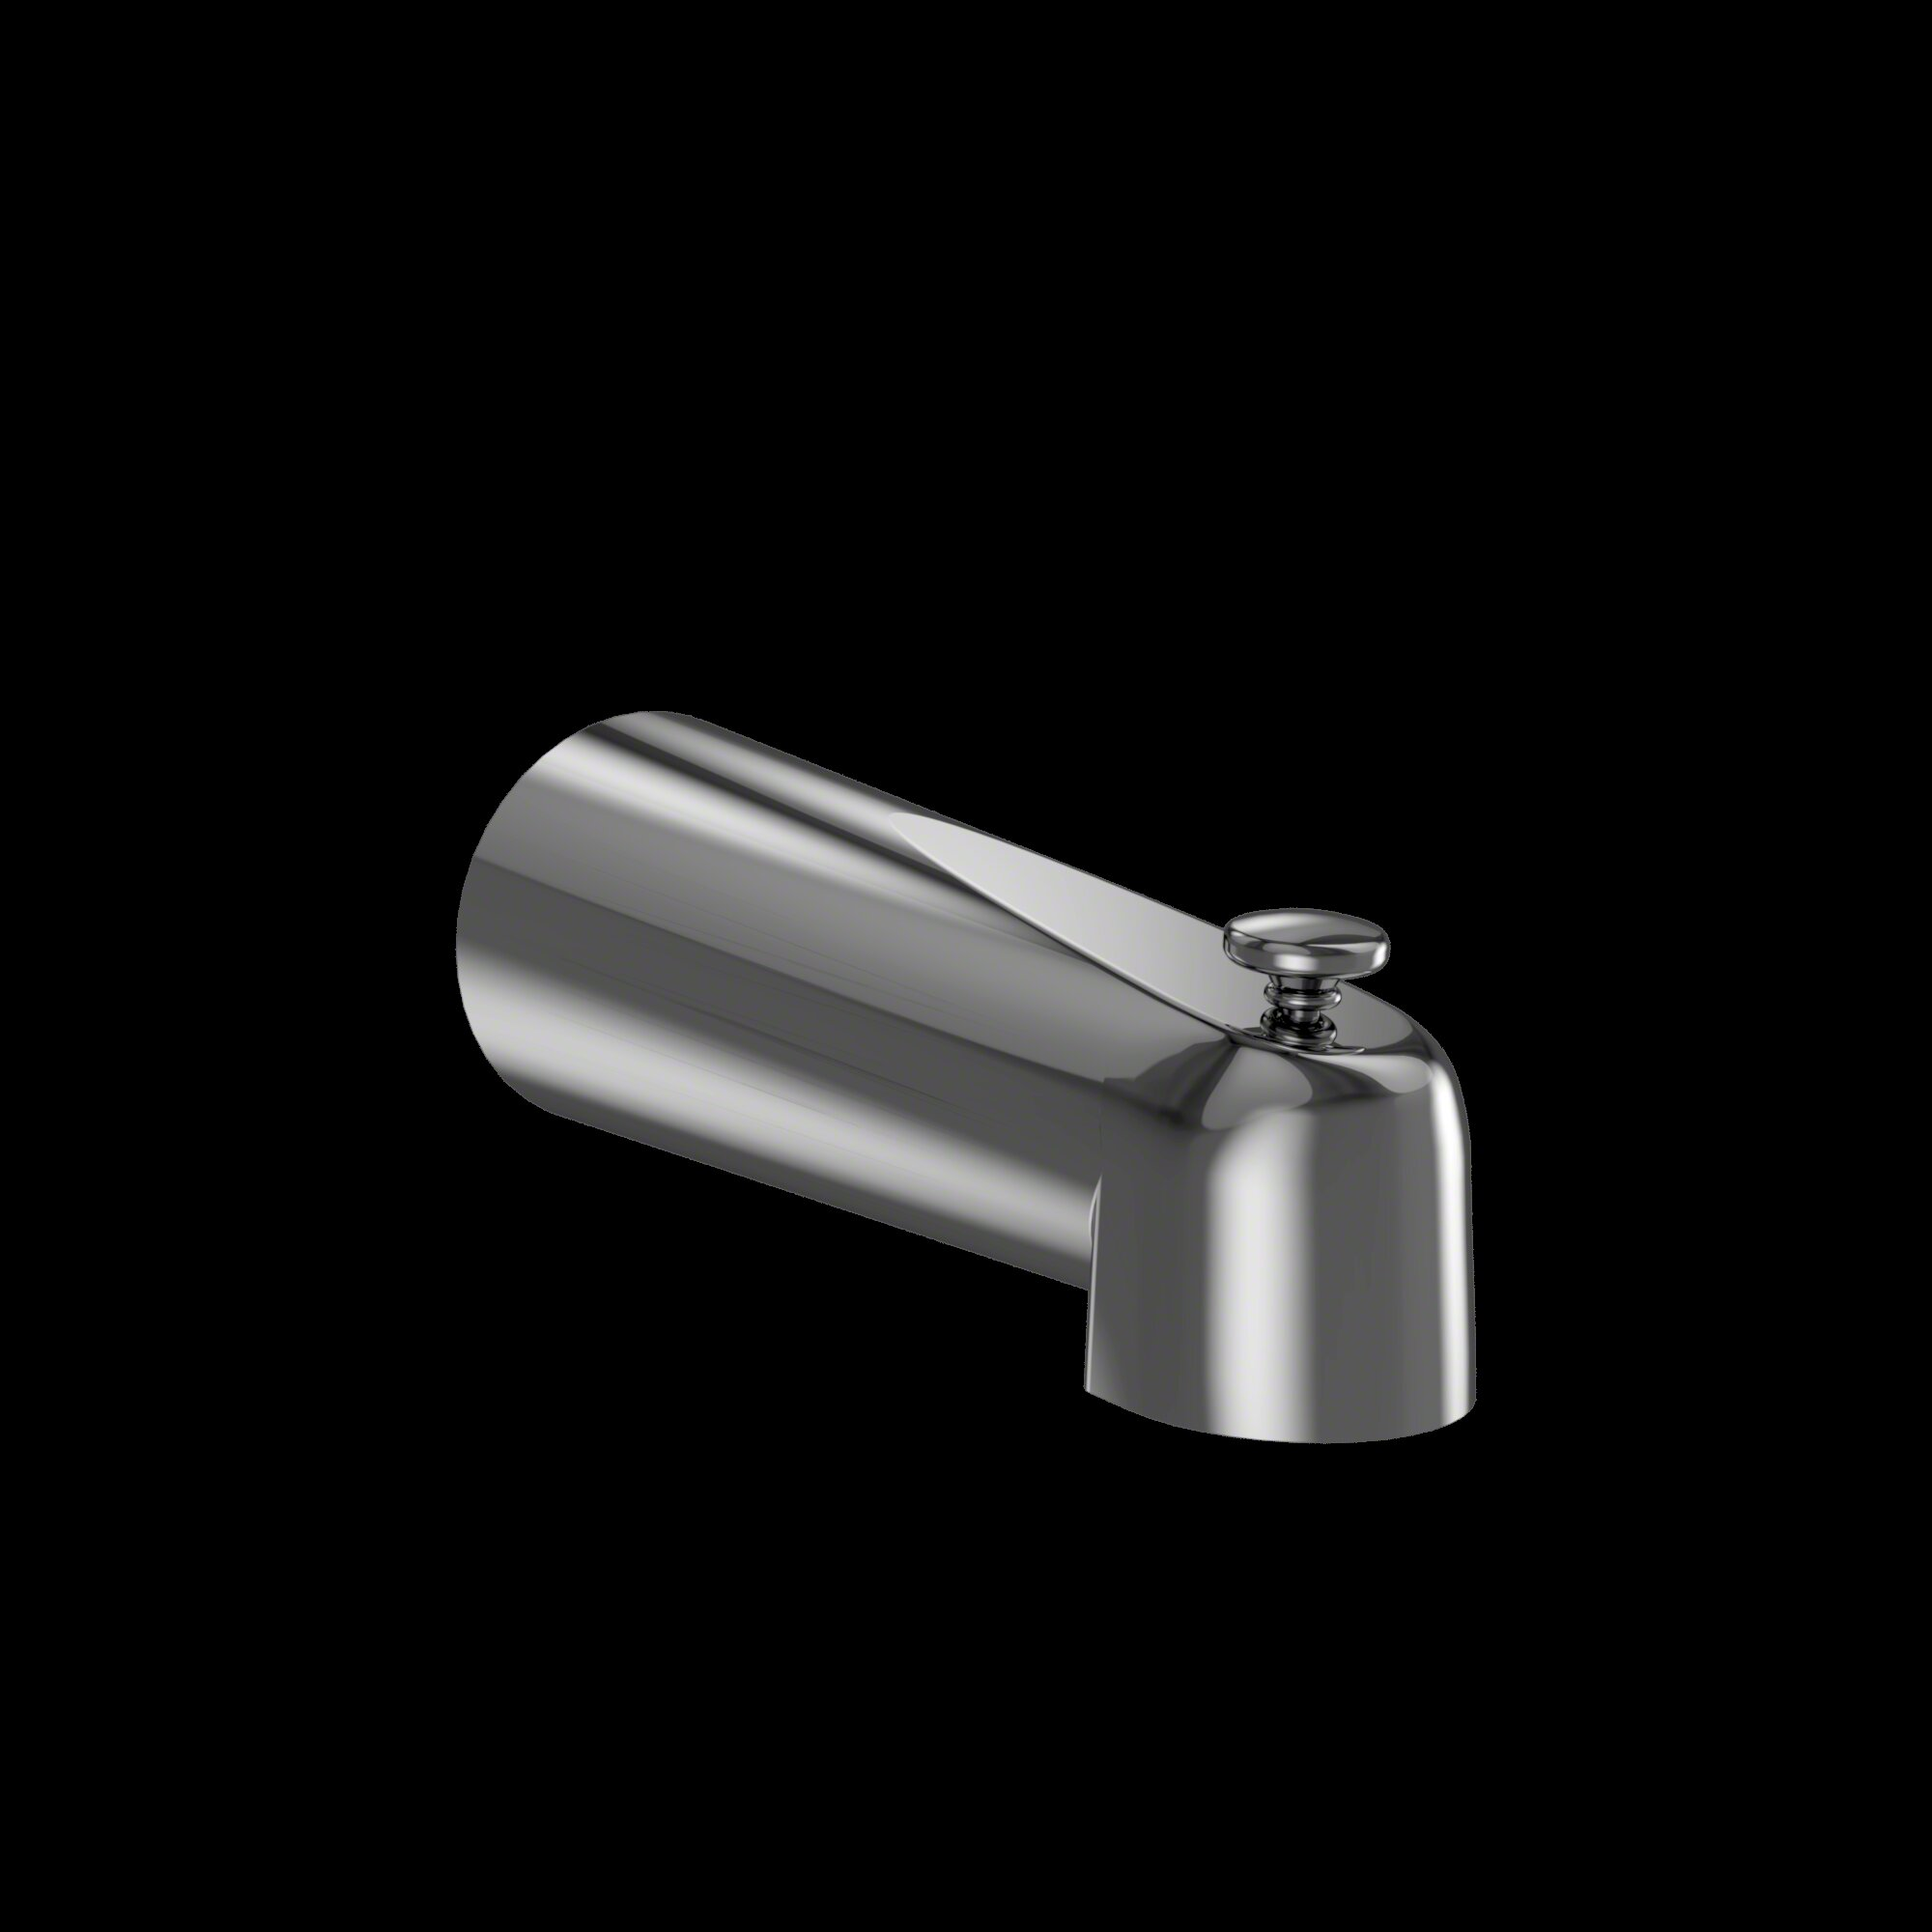 Toto Diverter Wall Mounted Tub Spout | Wayfair